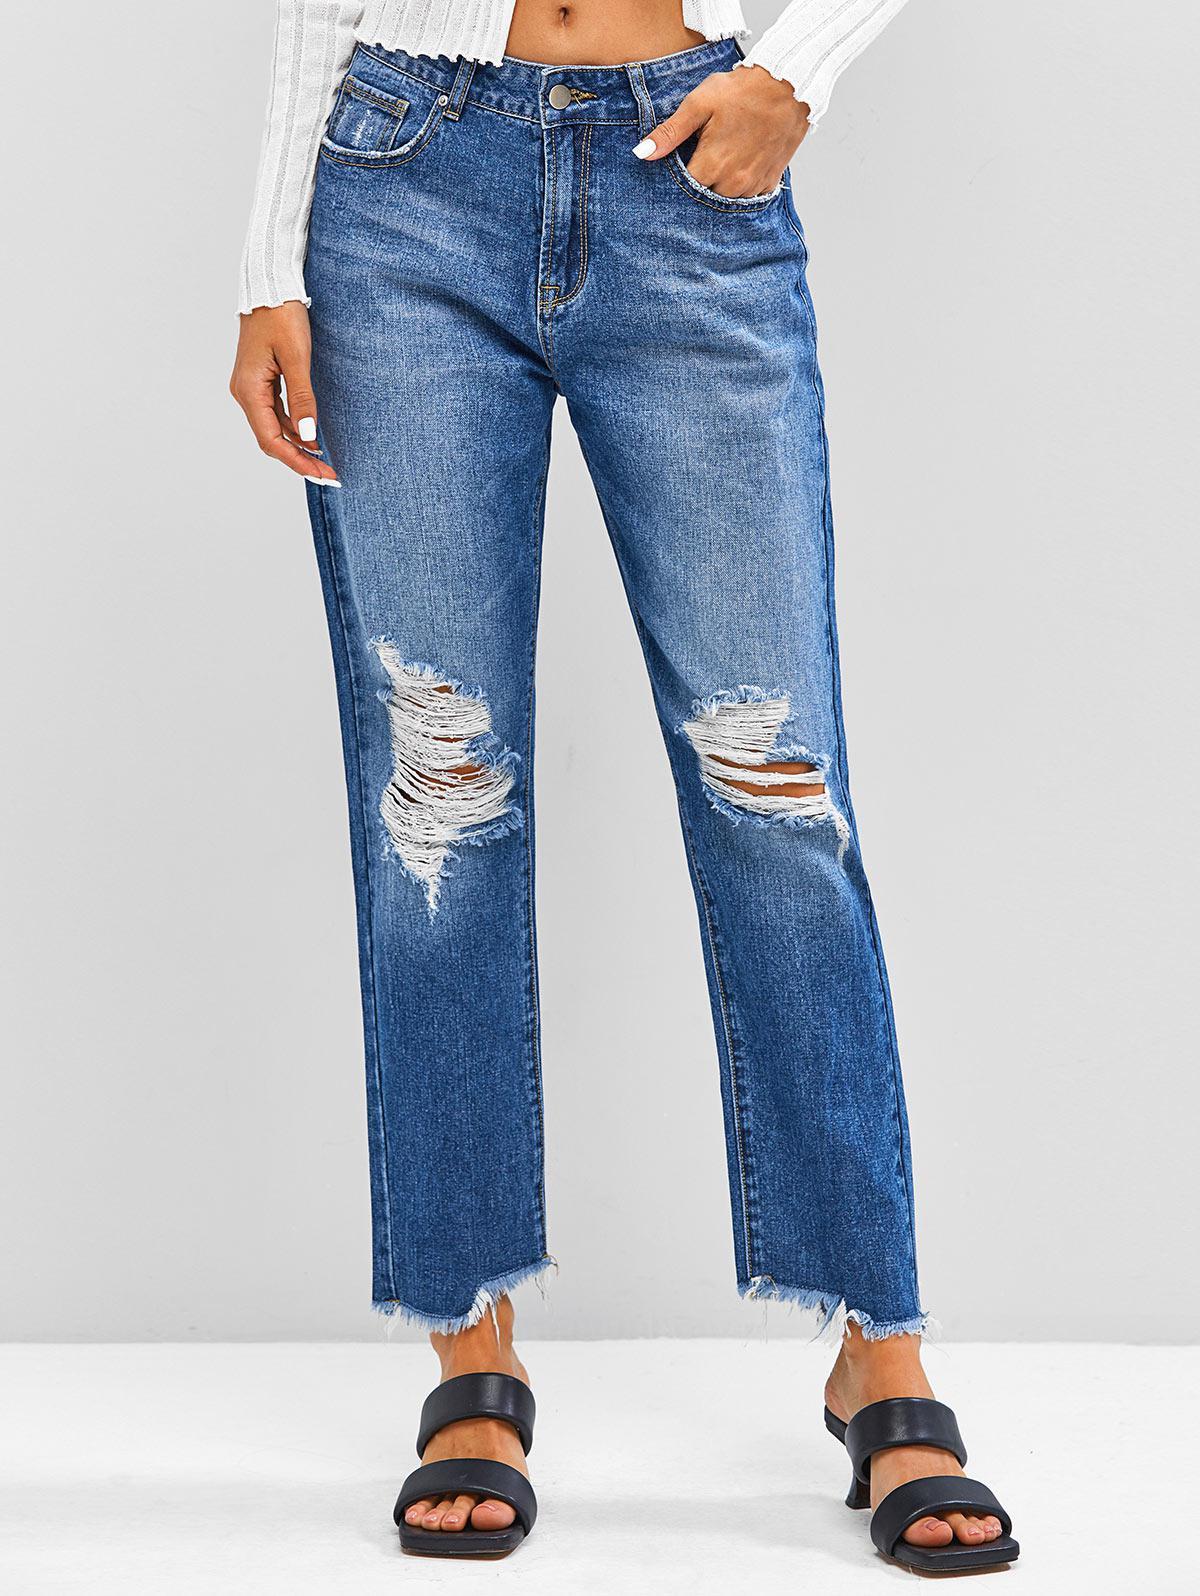 ZAFUL Distressed Frayed Zipper Fly Jeans